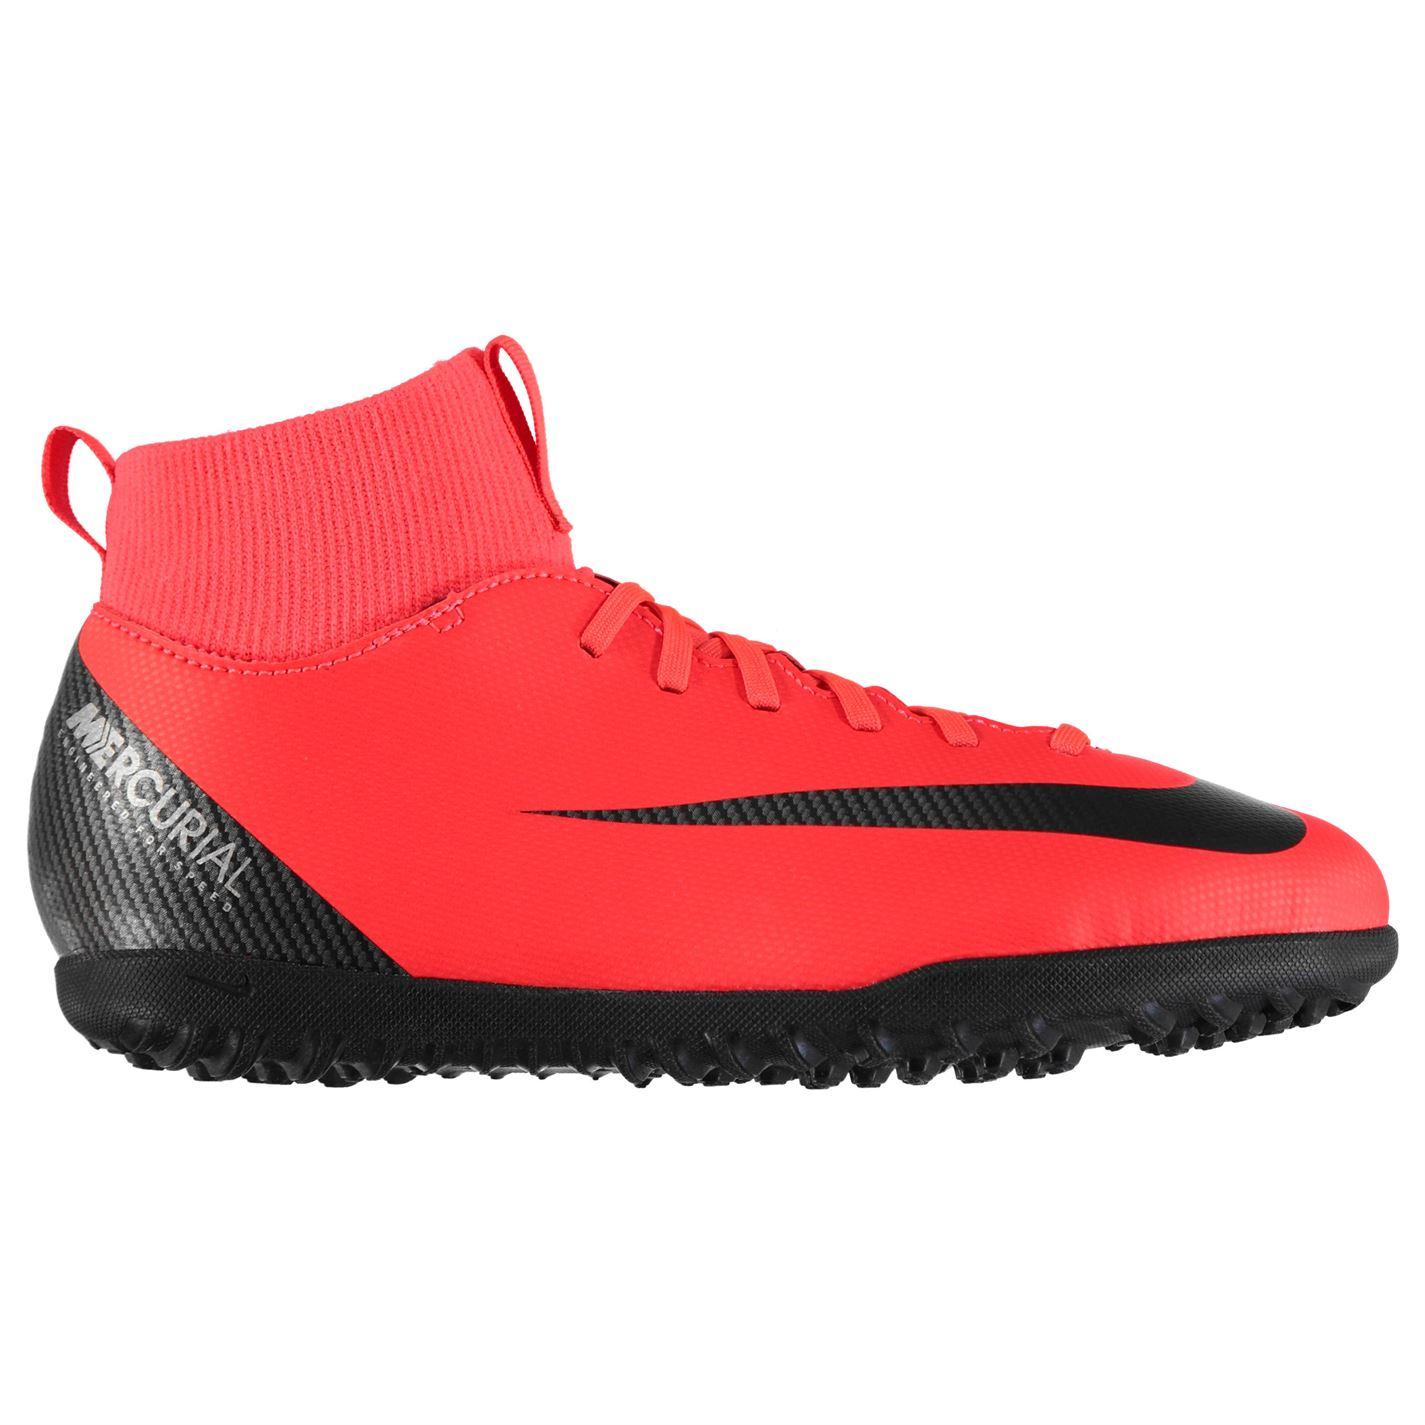 2a41b05cddd8 ... Nike Mercurial Superfly Club DF Dětské Astro Turf Tenisky. -10% -30%